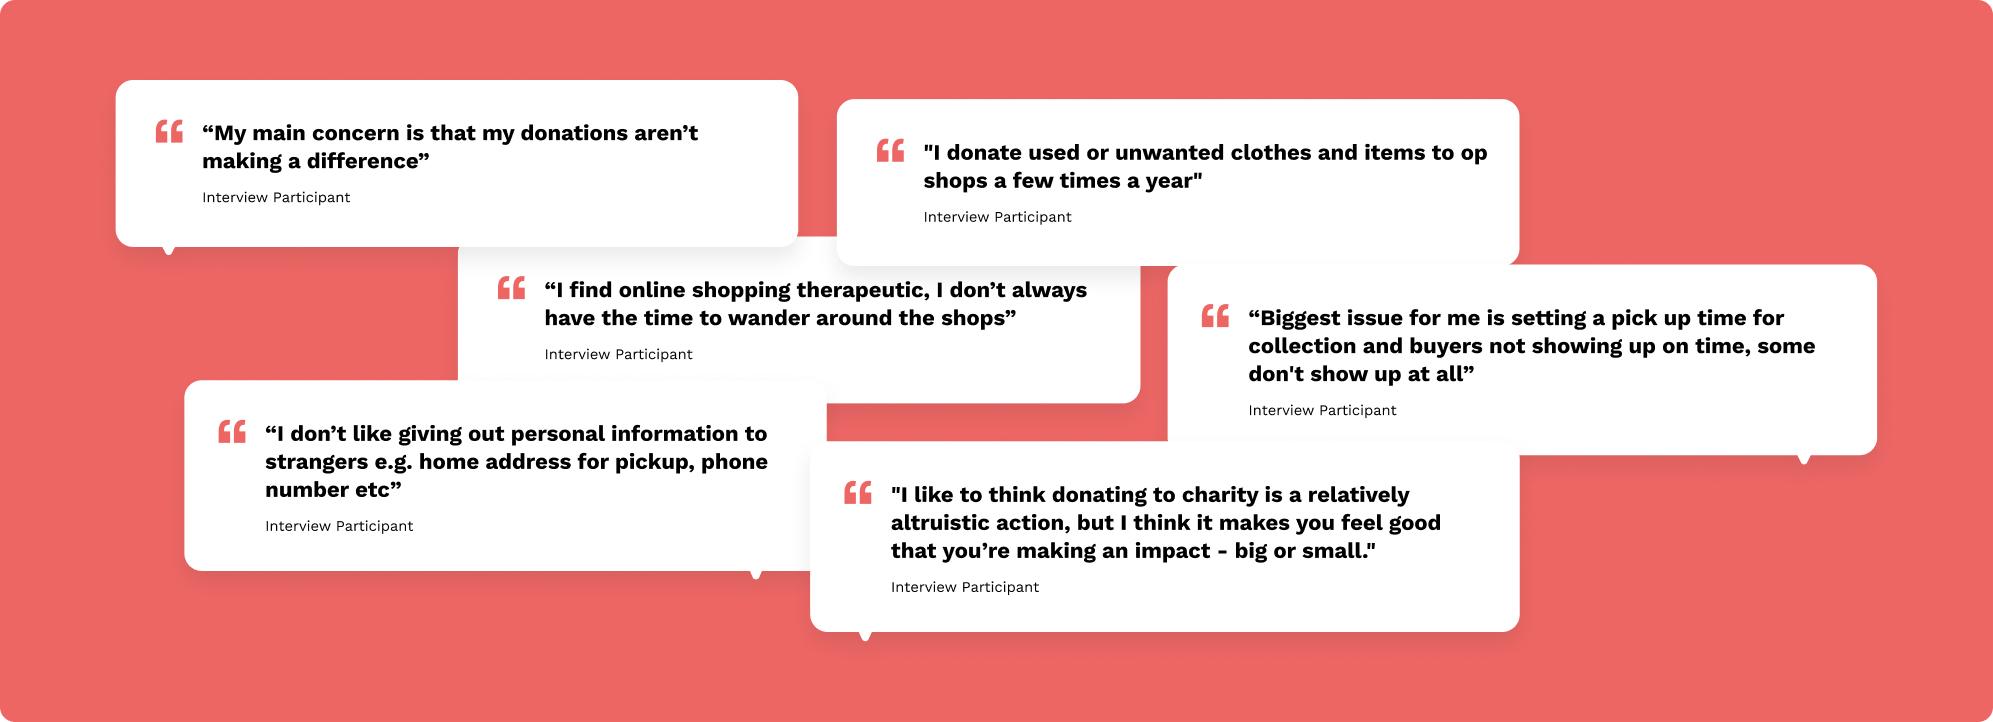 charityBay Case Study Key Insights